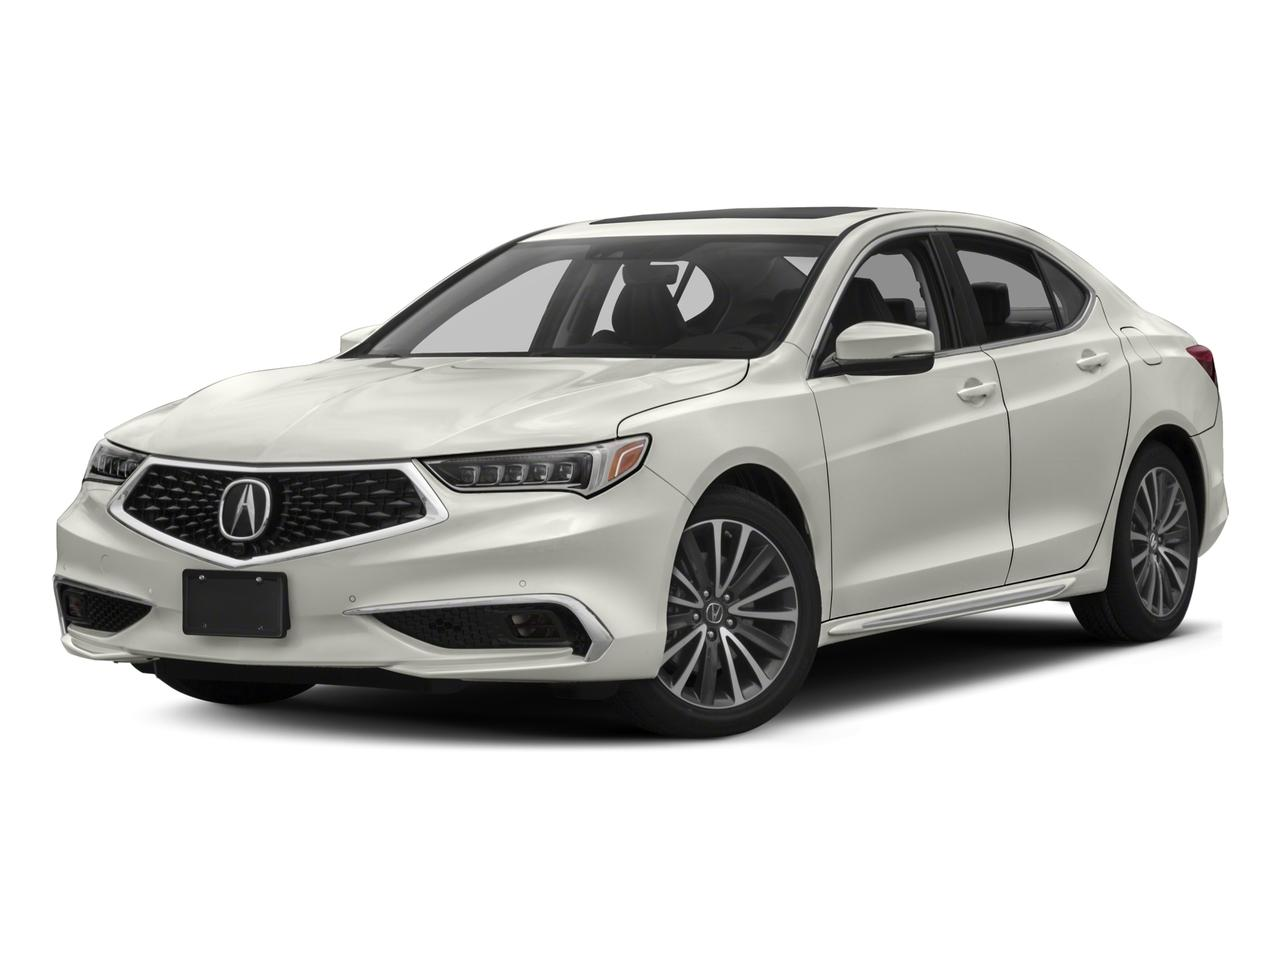 2018 Acura TLX Vehicle Photo in Tucson, AZ 85705